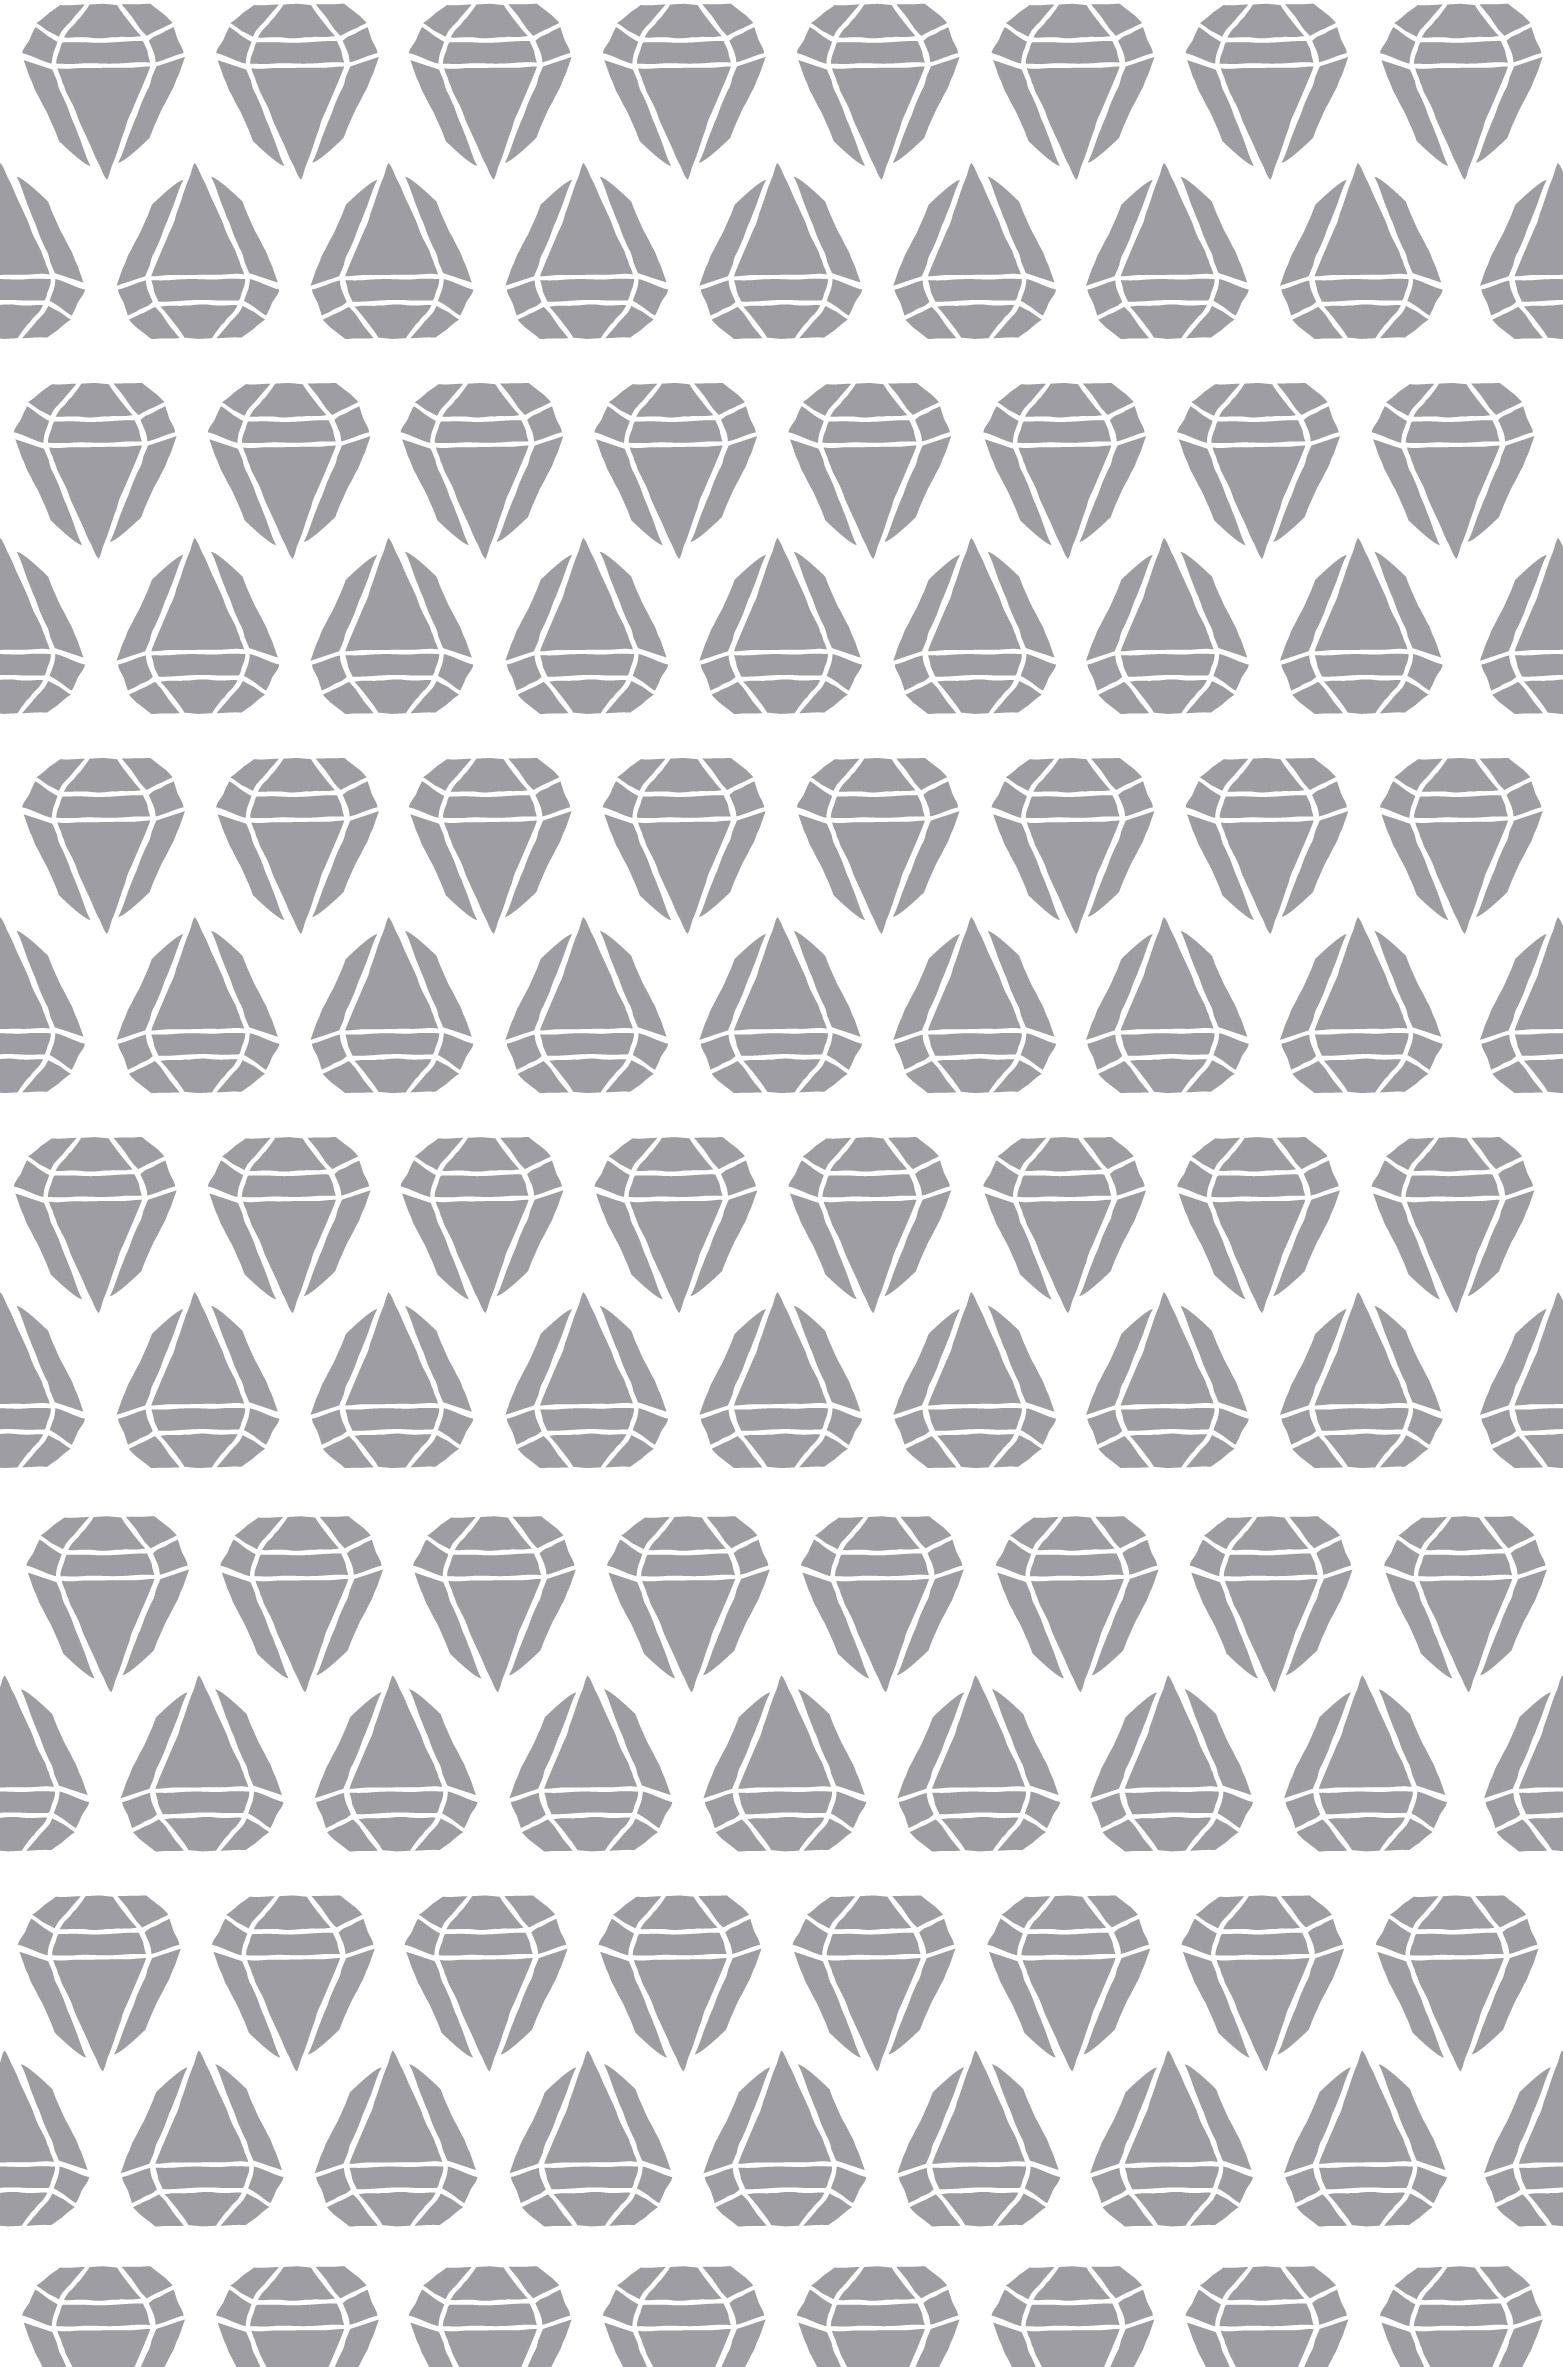 DMD_iPhone_Repeat Alt Gem Grey on White-01.jpg